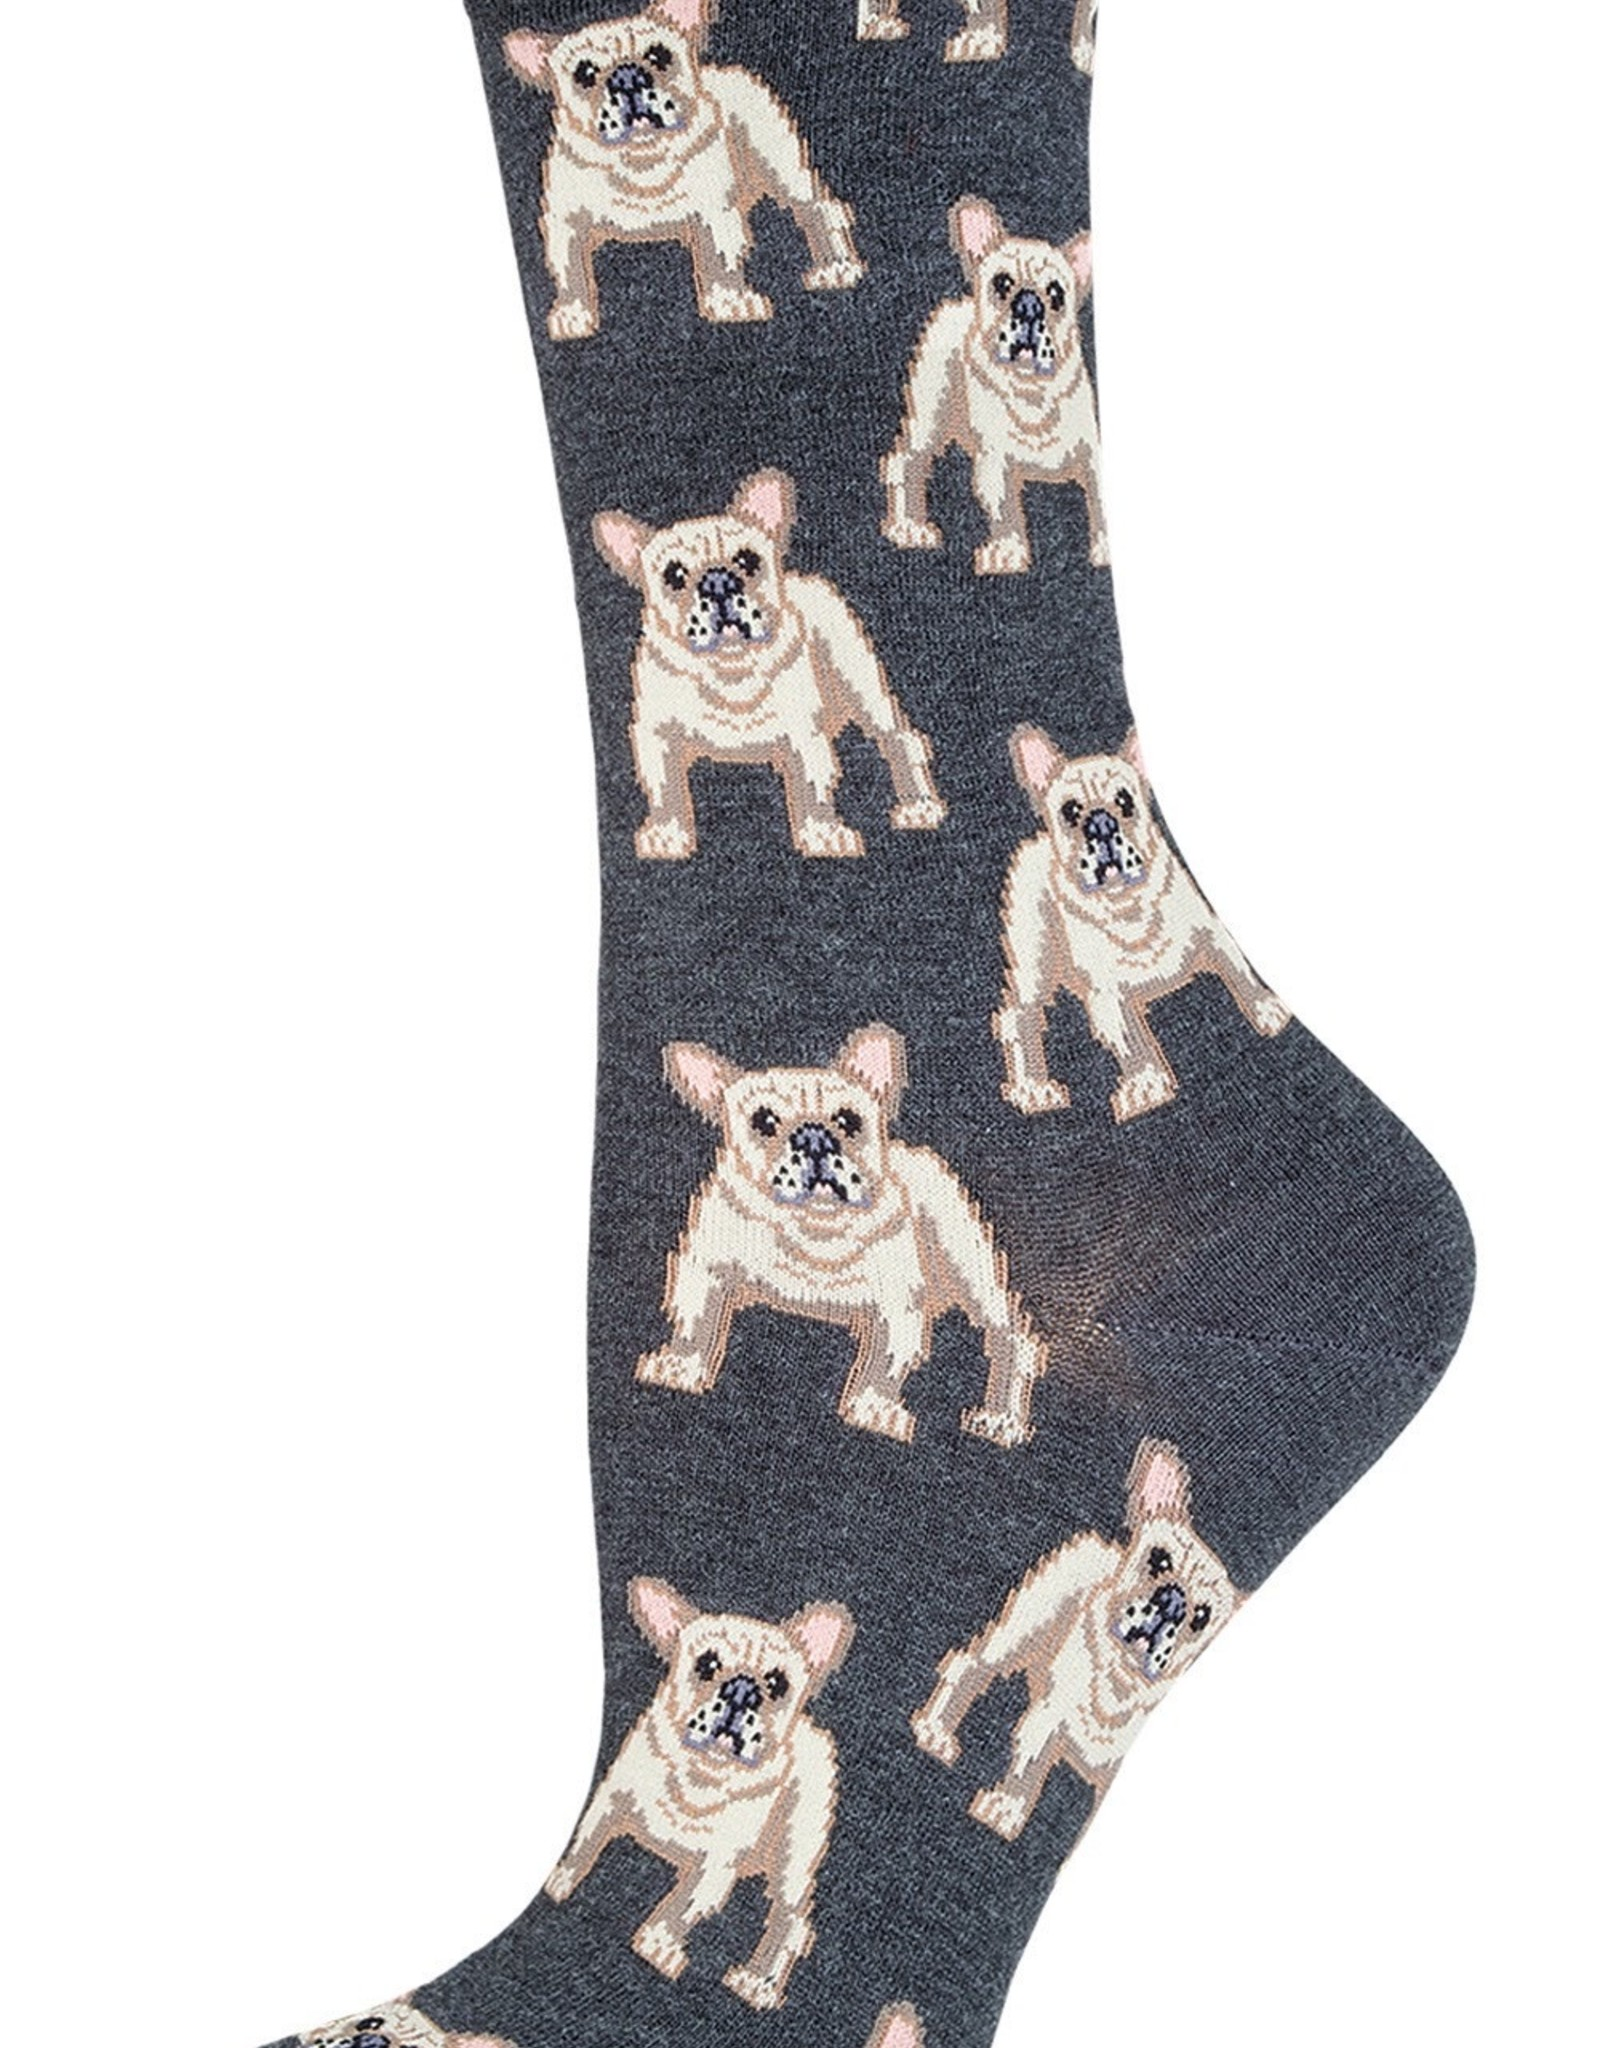 Sock Smith Frenchie charcoal heather socks